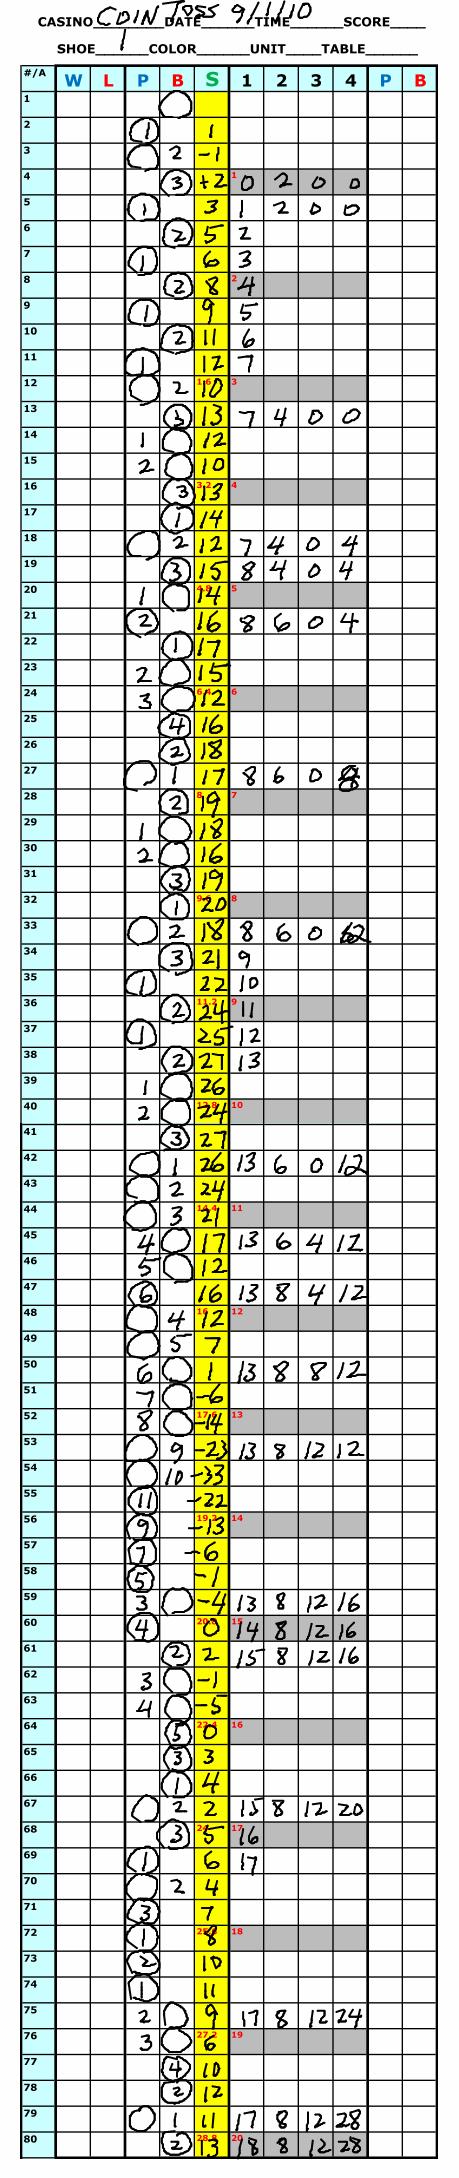 Blackjack same score